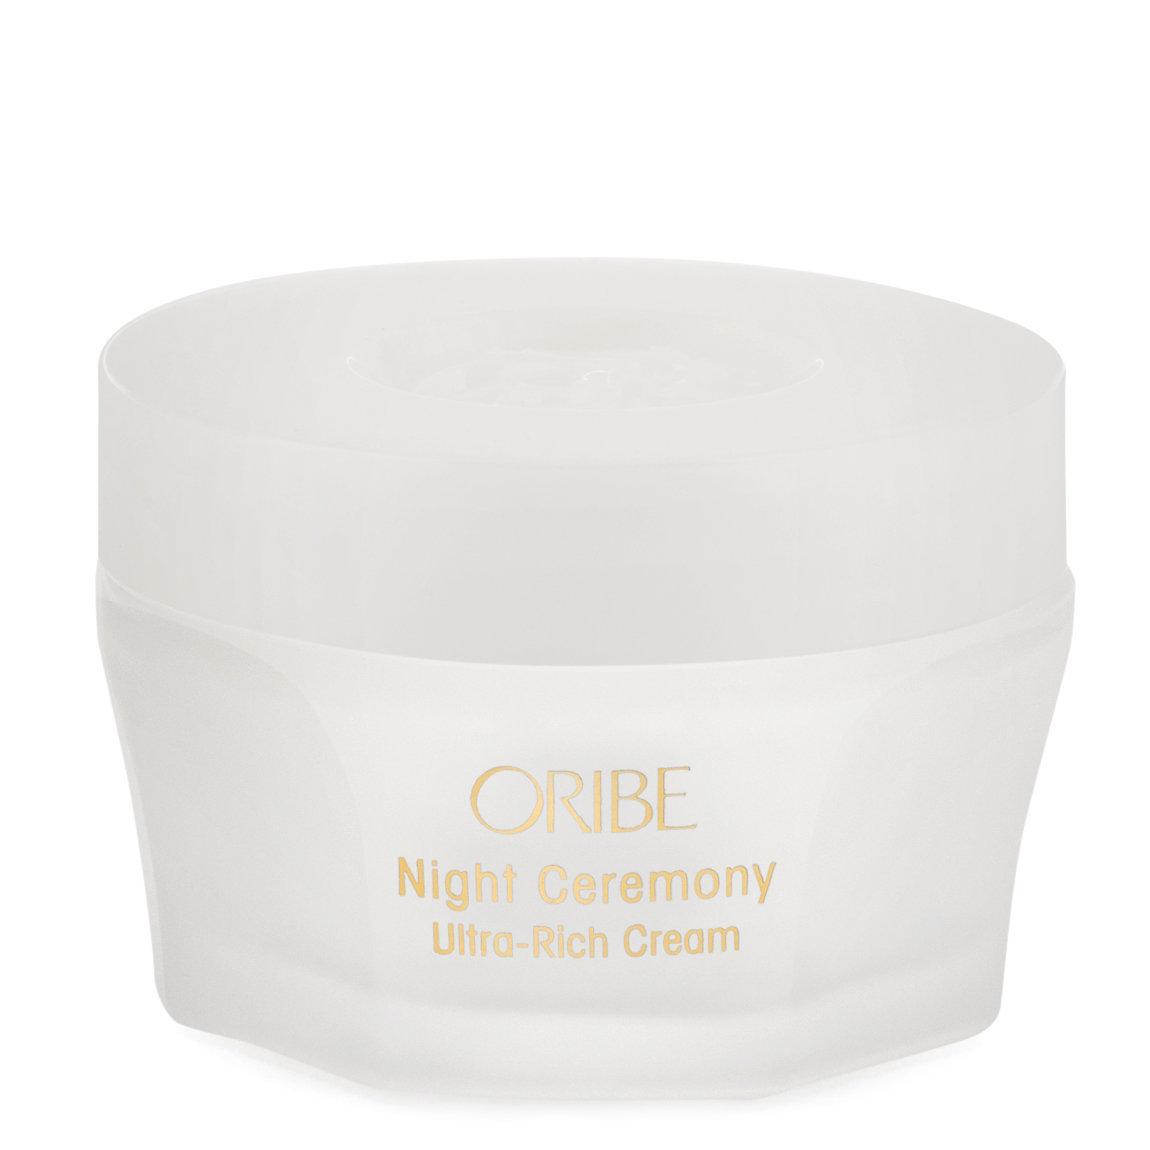 Oribe Night Ceremony Ultra-Rich Cream product swatch.